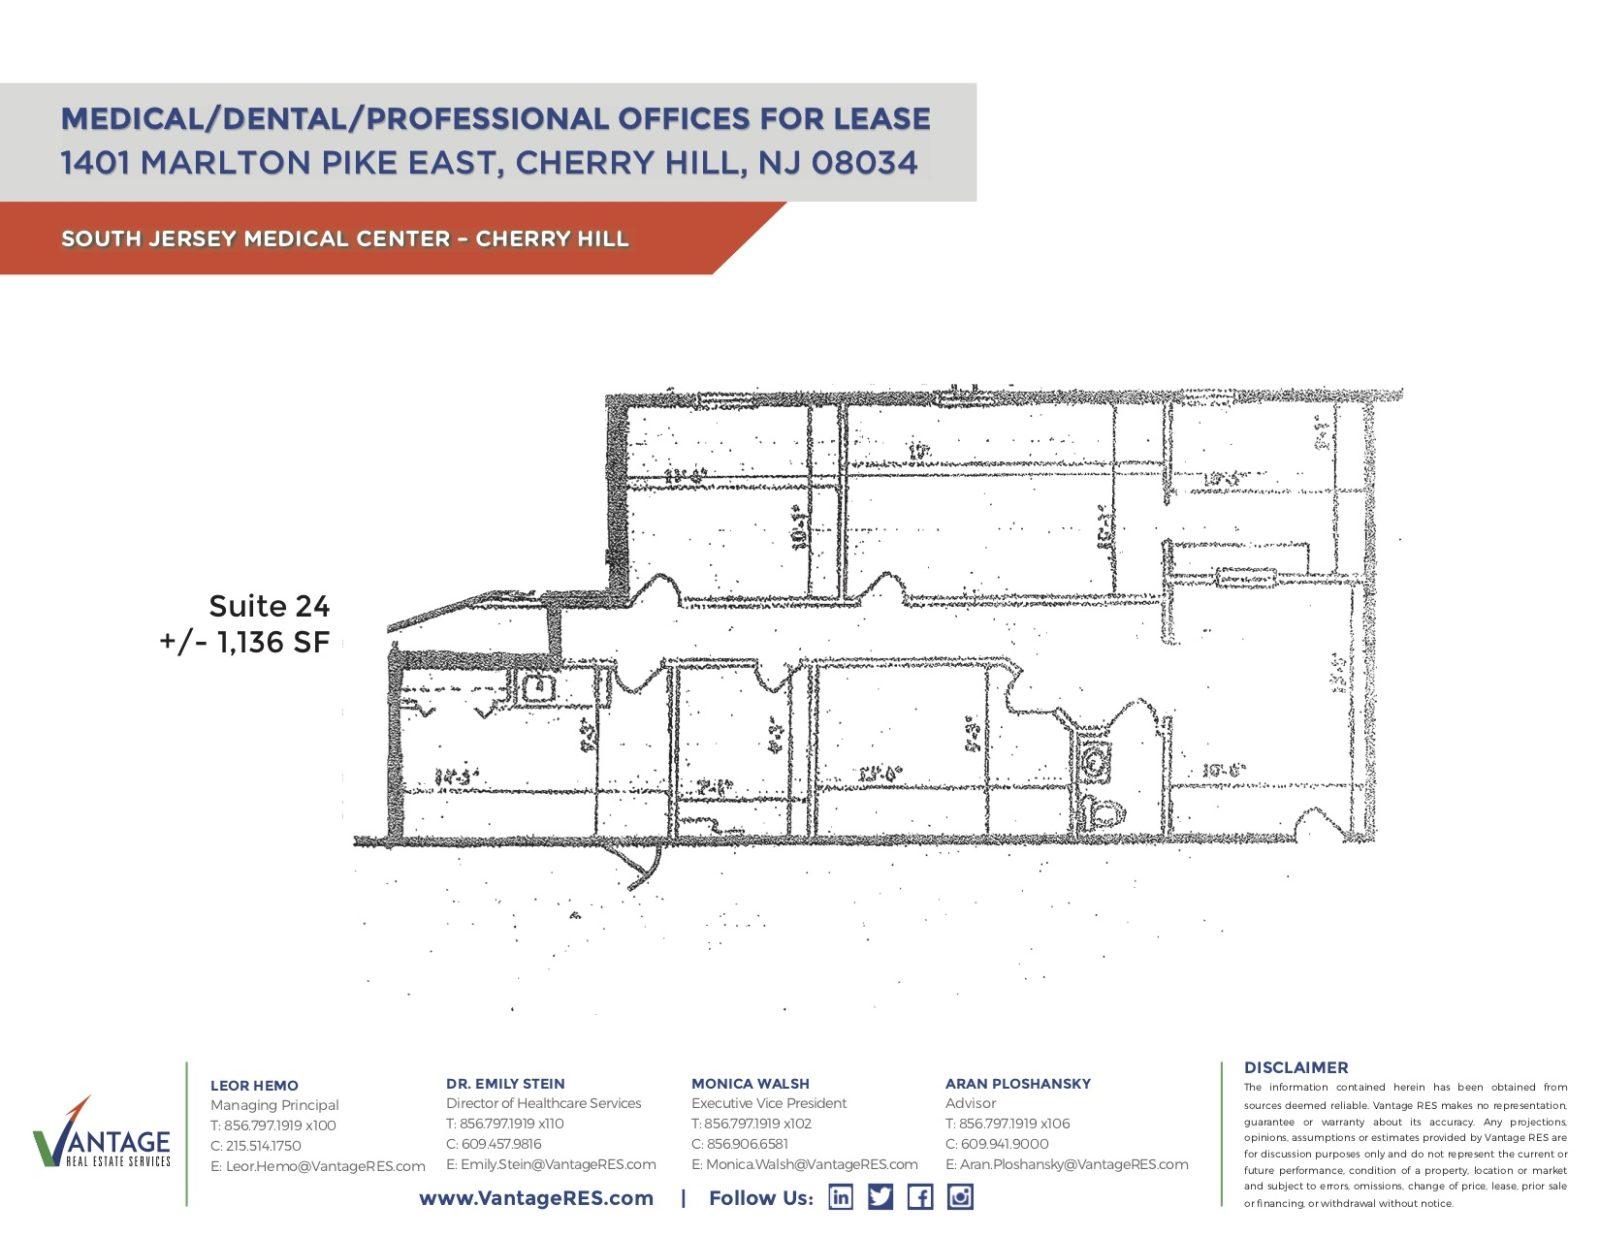 Suite 24 Floorplan